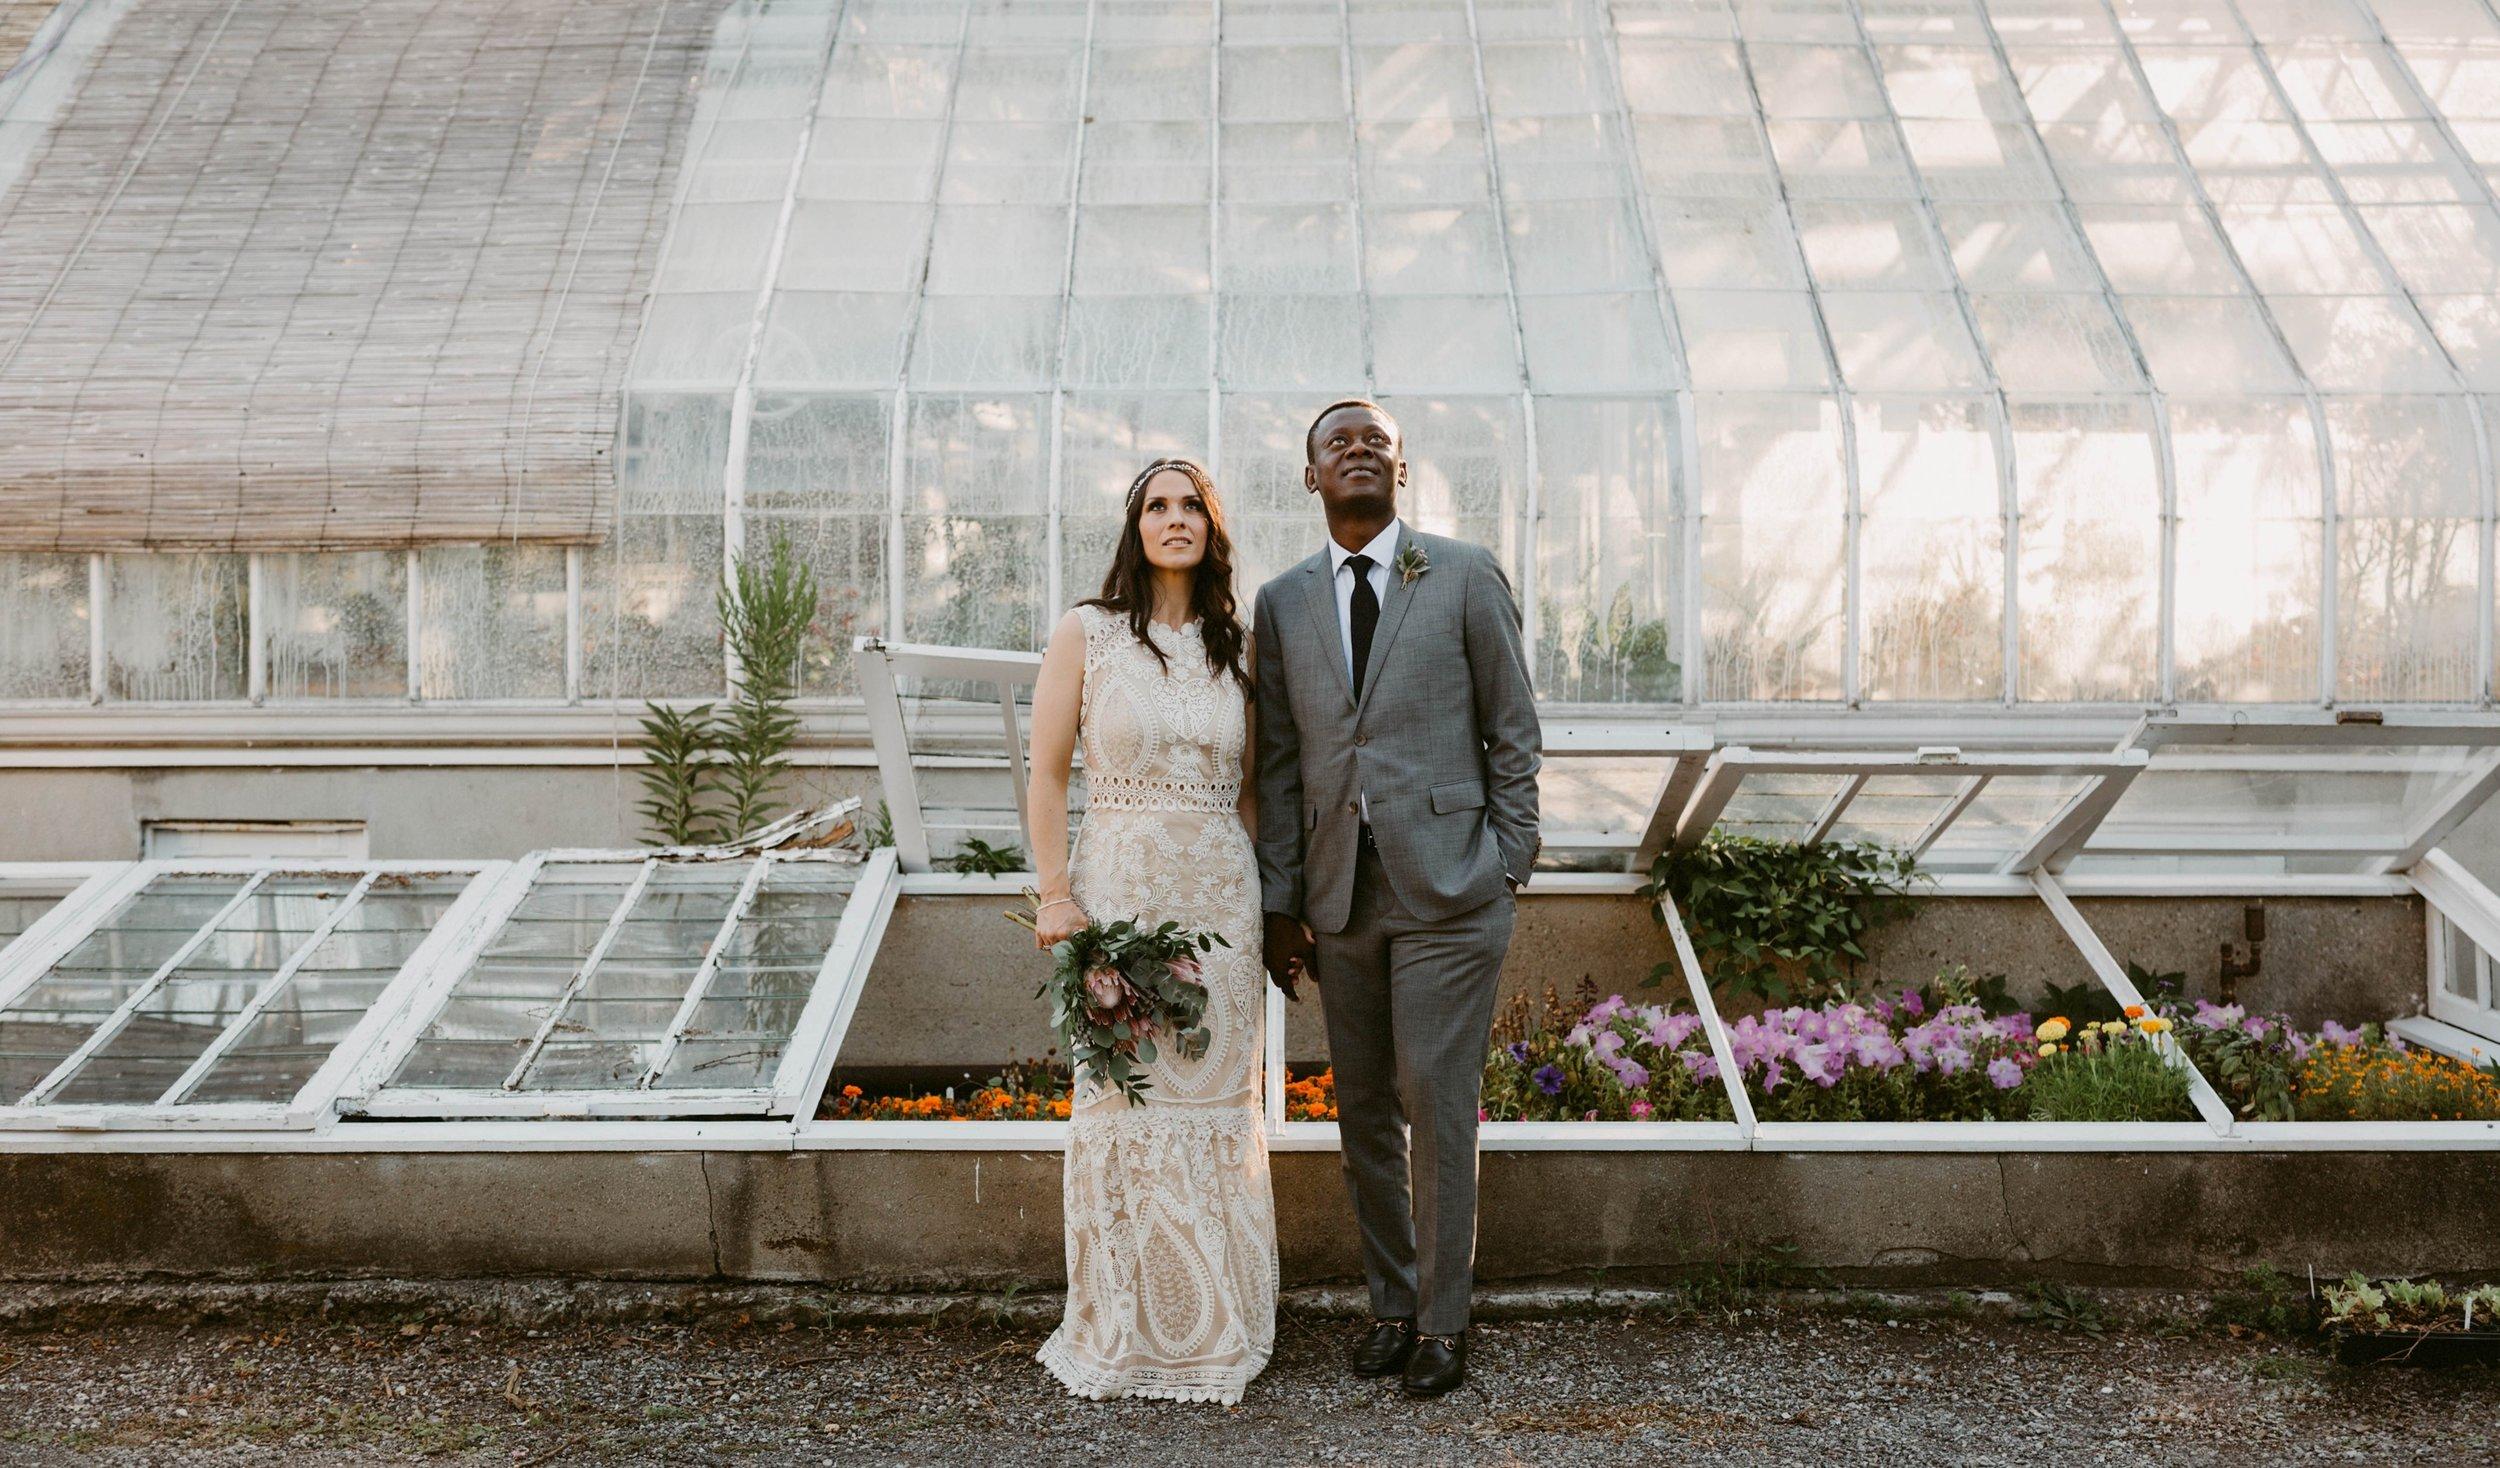 055_Spadina House Wedding (383 of 748)_House_Spadina_intimate_Toronto_Wedding.jpg